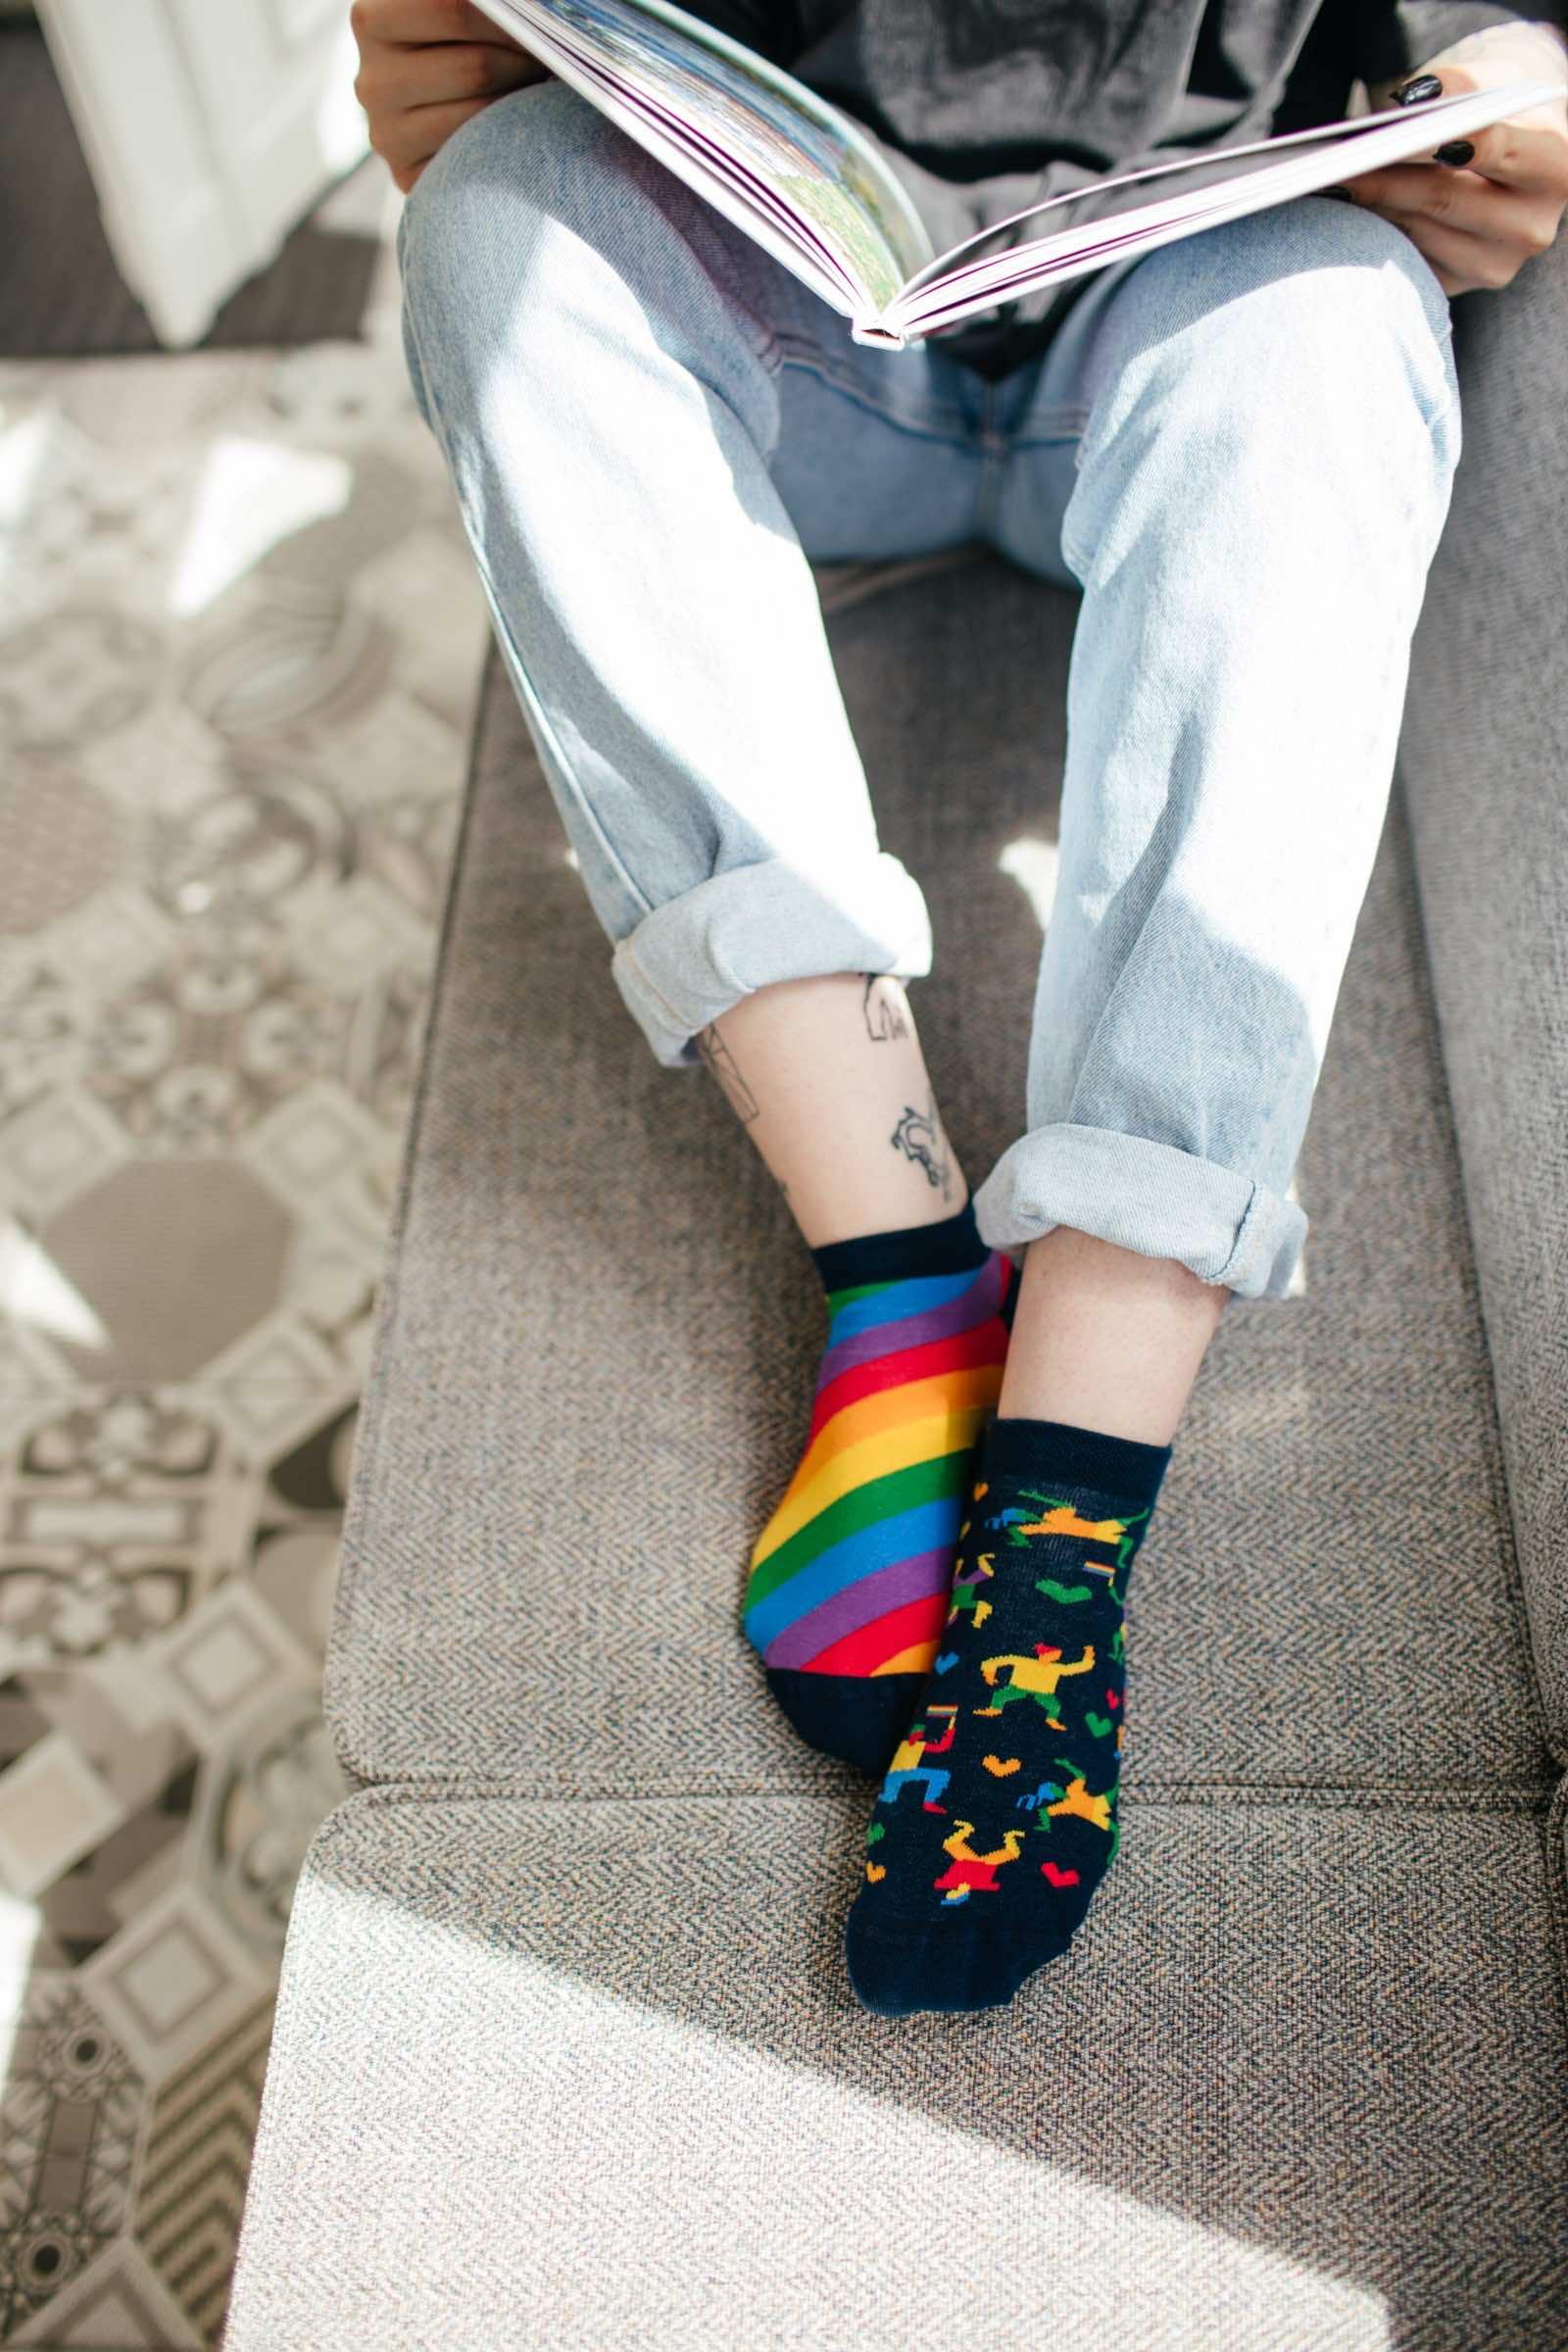 OVER THE RAINBOW LOW - Rainbow low socks